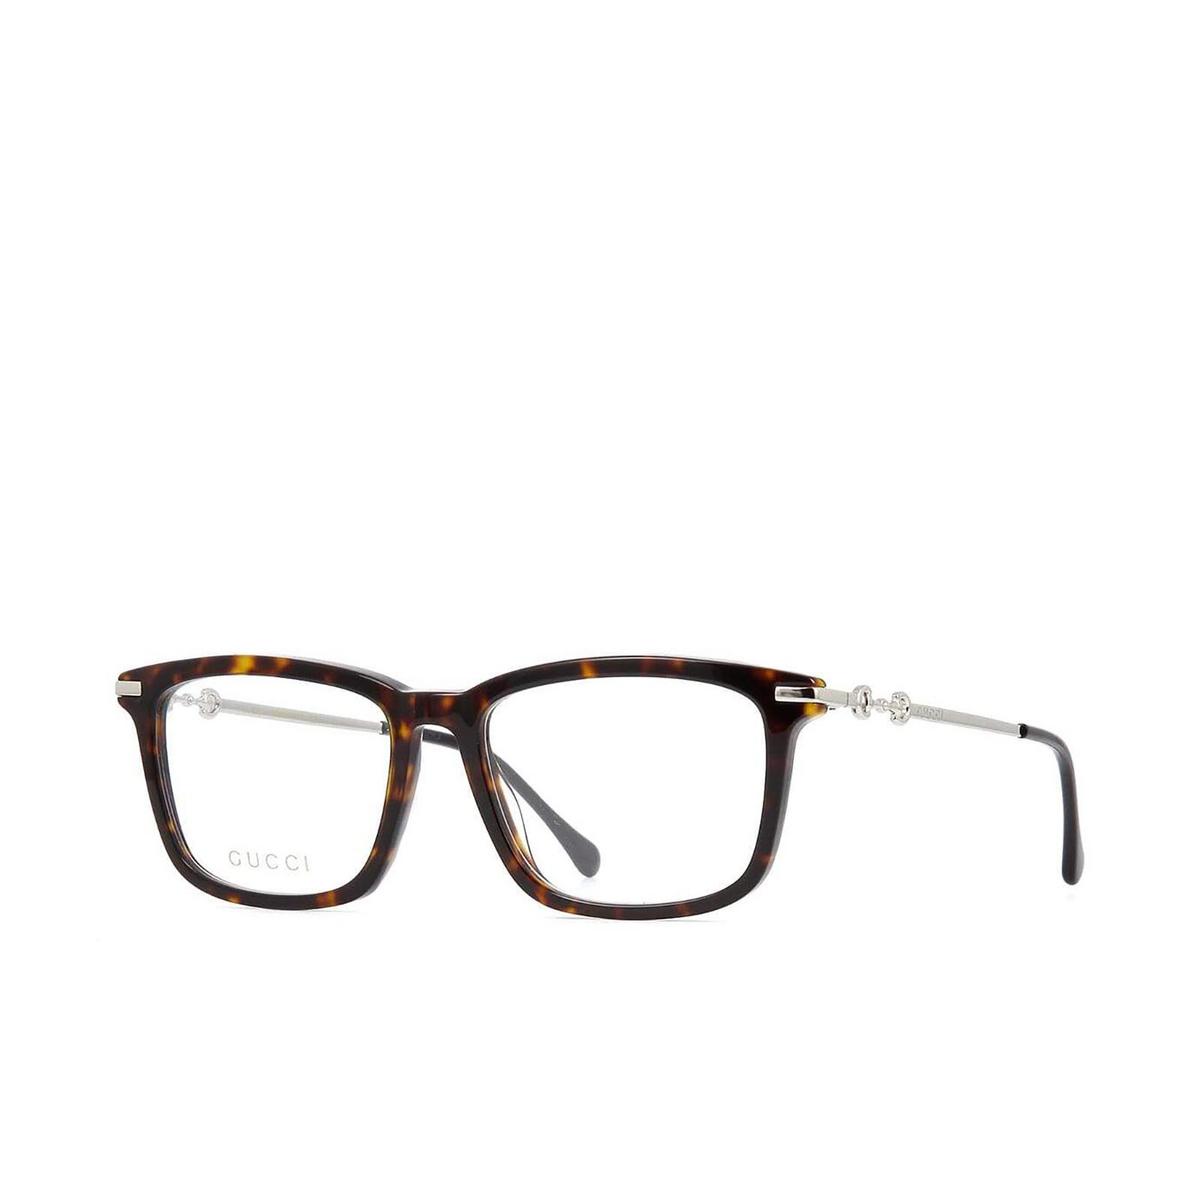 Gucci® Rectangle Eyeglasses: GG0920O color Dark Havana 005 - three-quarters view.